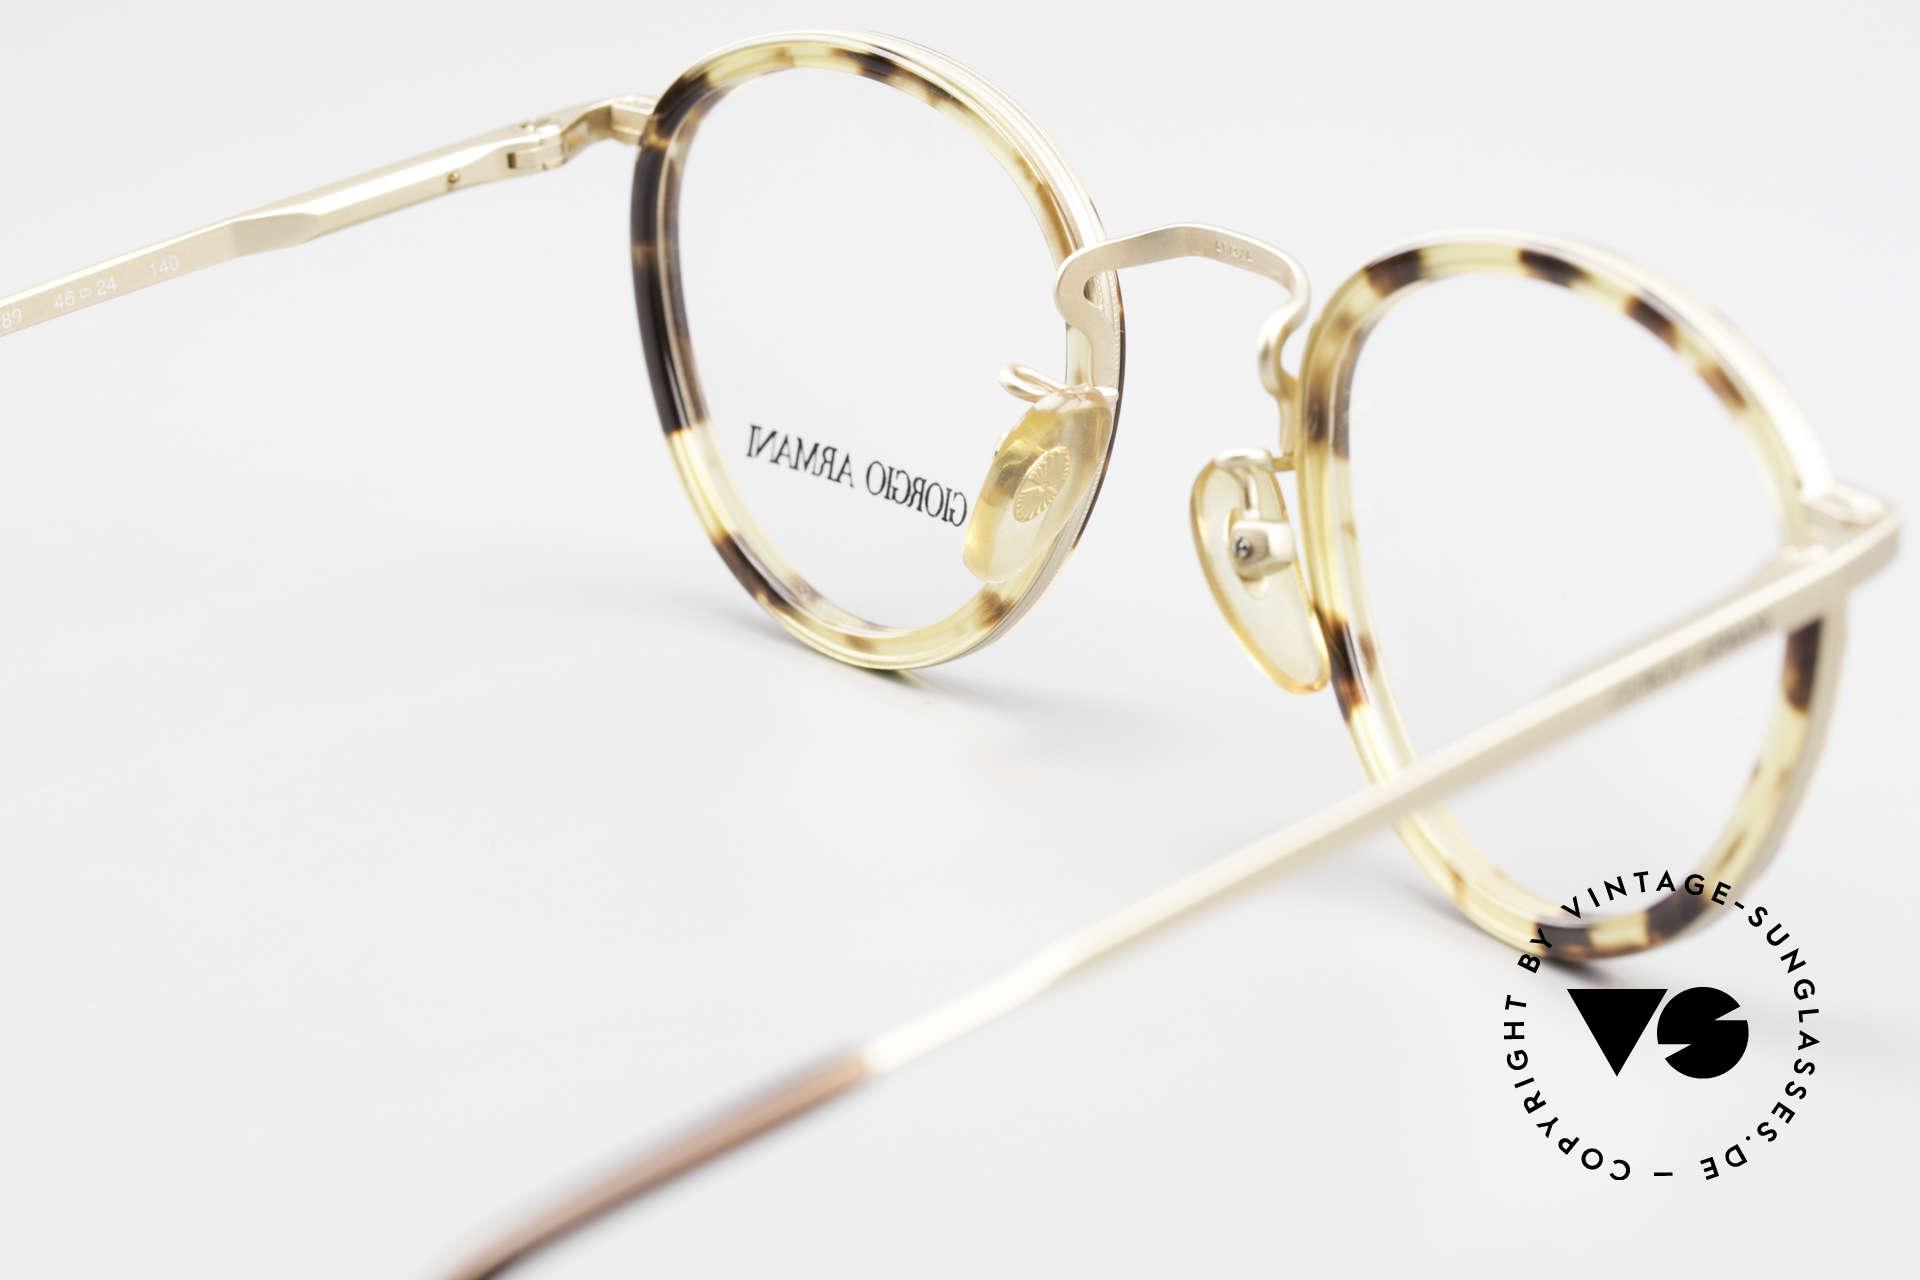 Giorgio Armani 159 Panto Glasses Windsor Rings, NO RETRO SPECS, but a unique 30 years old original!, Made for Men